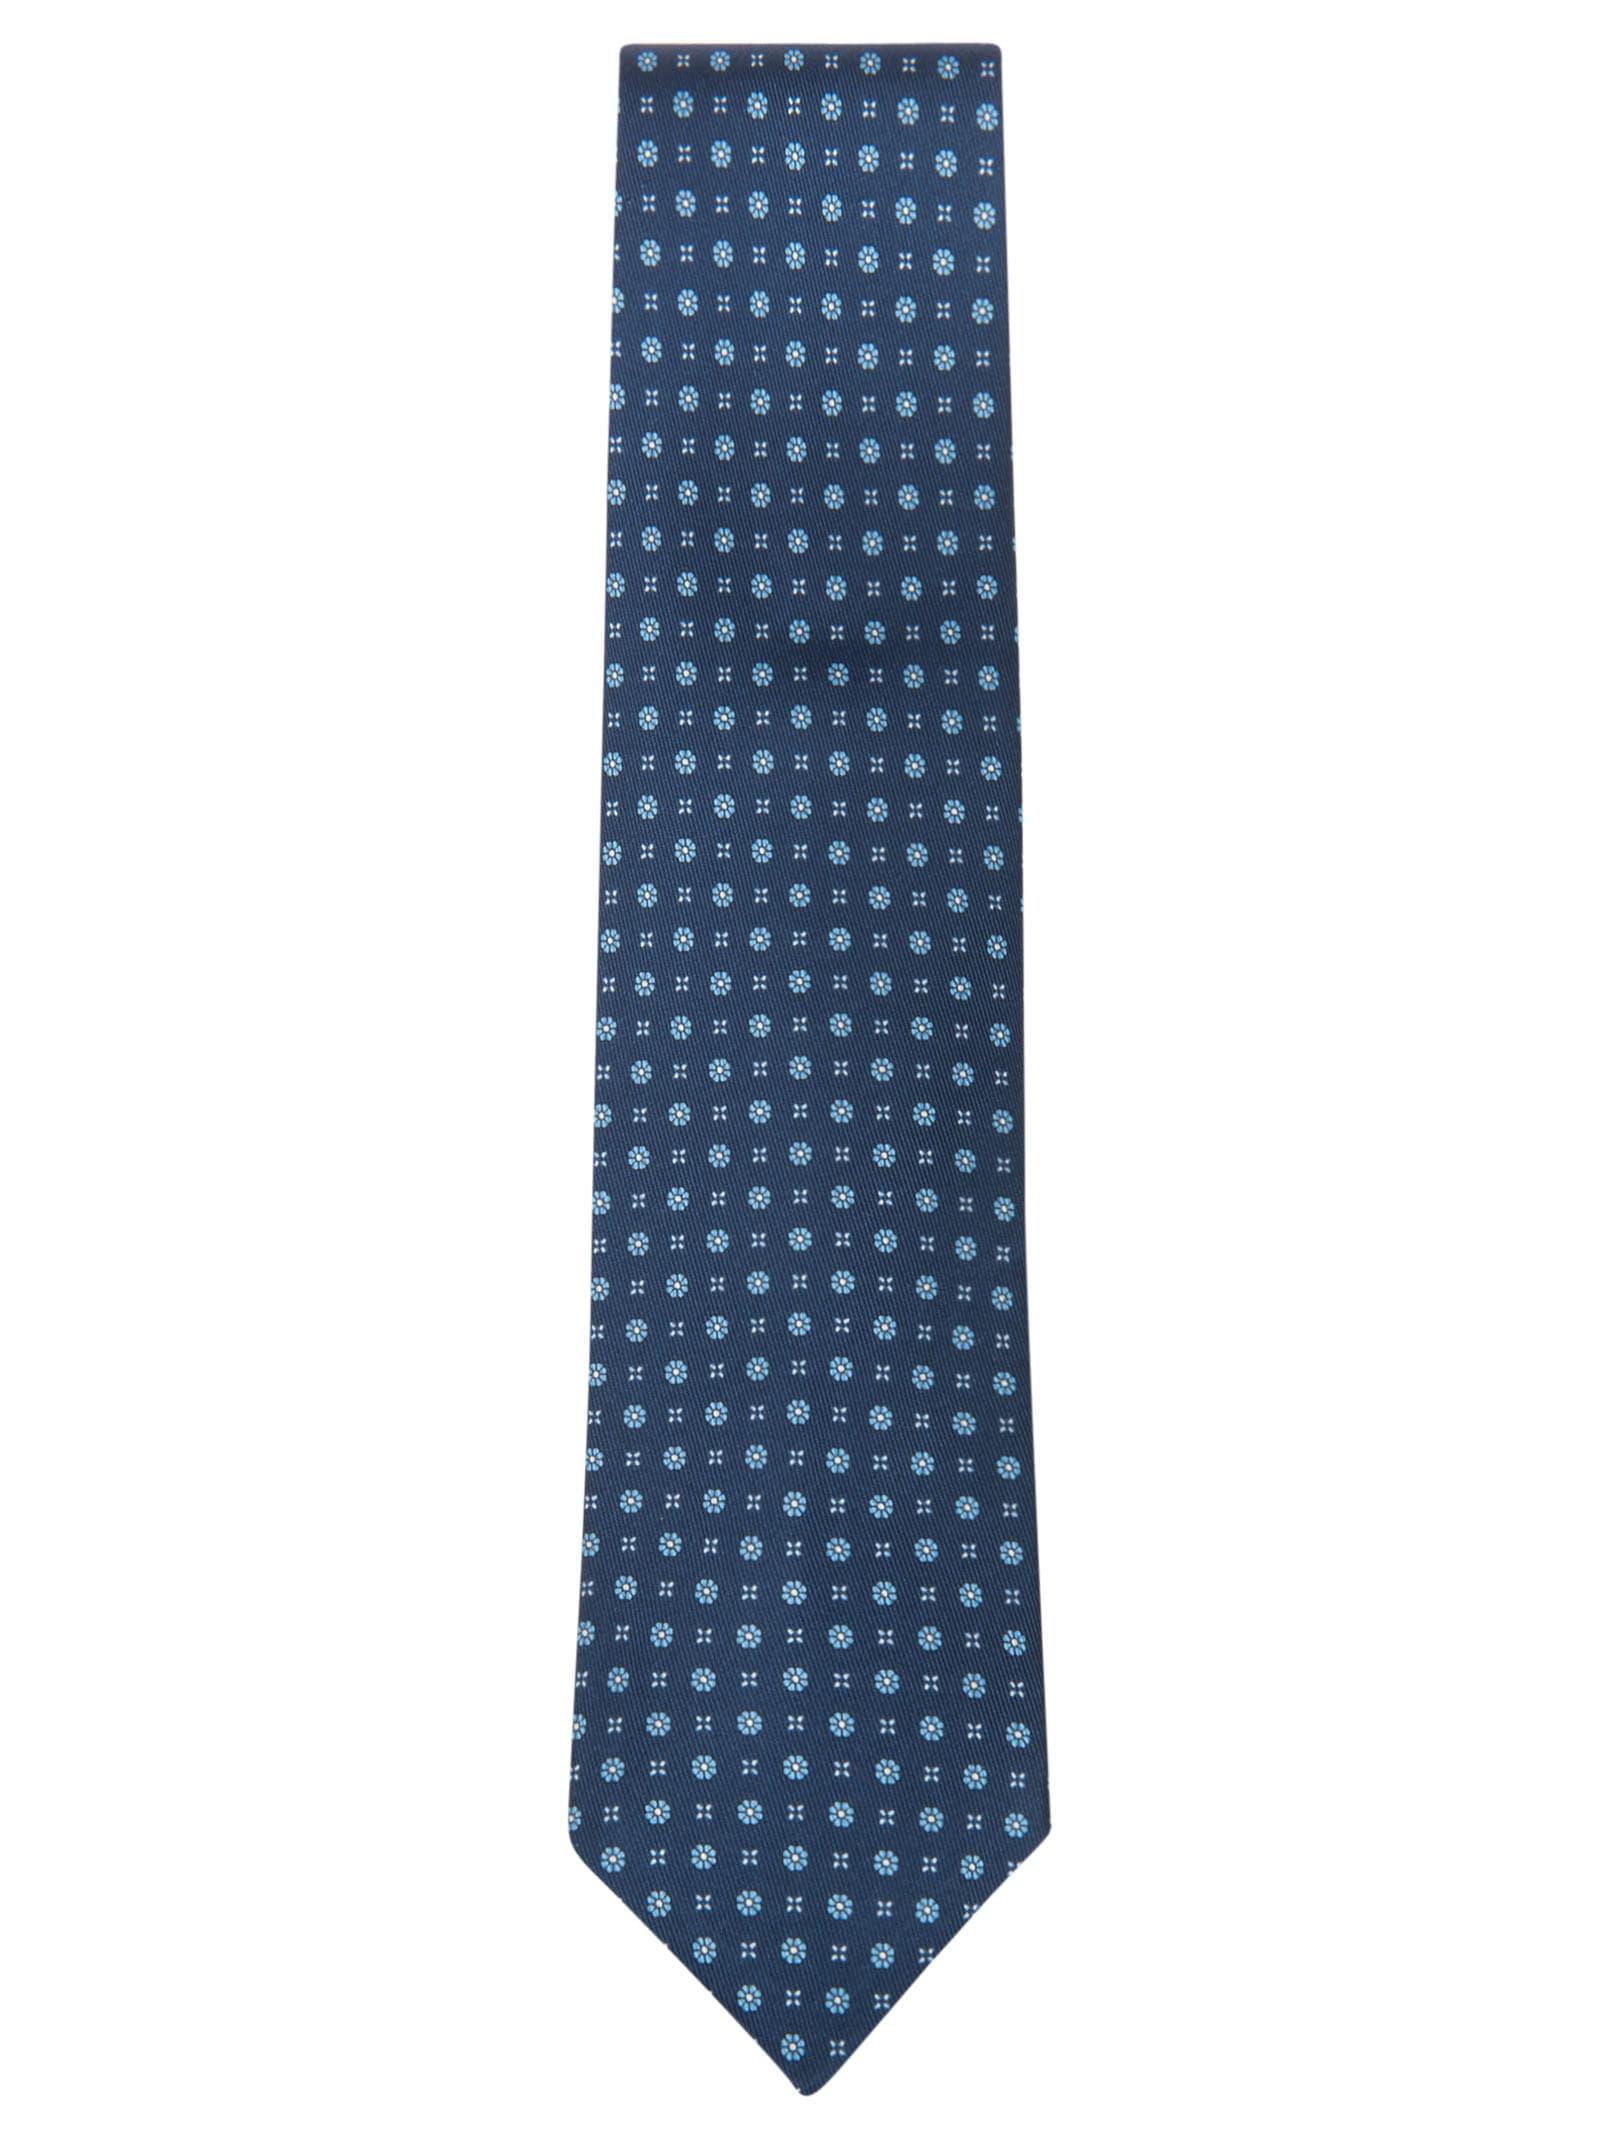 Floral Motif Neck Tie